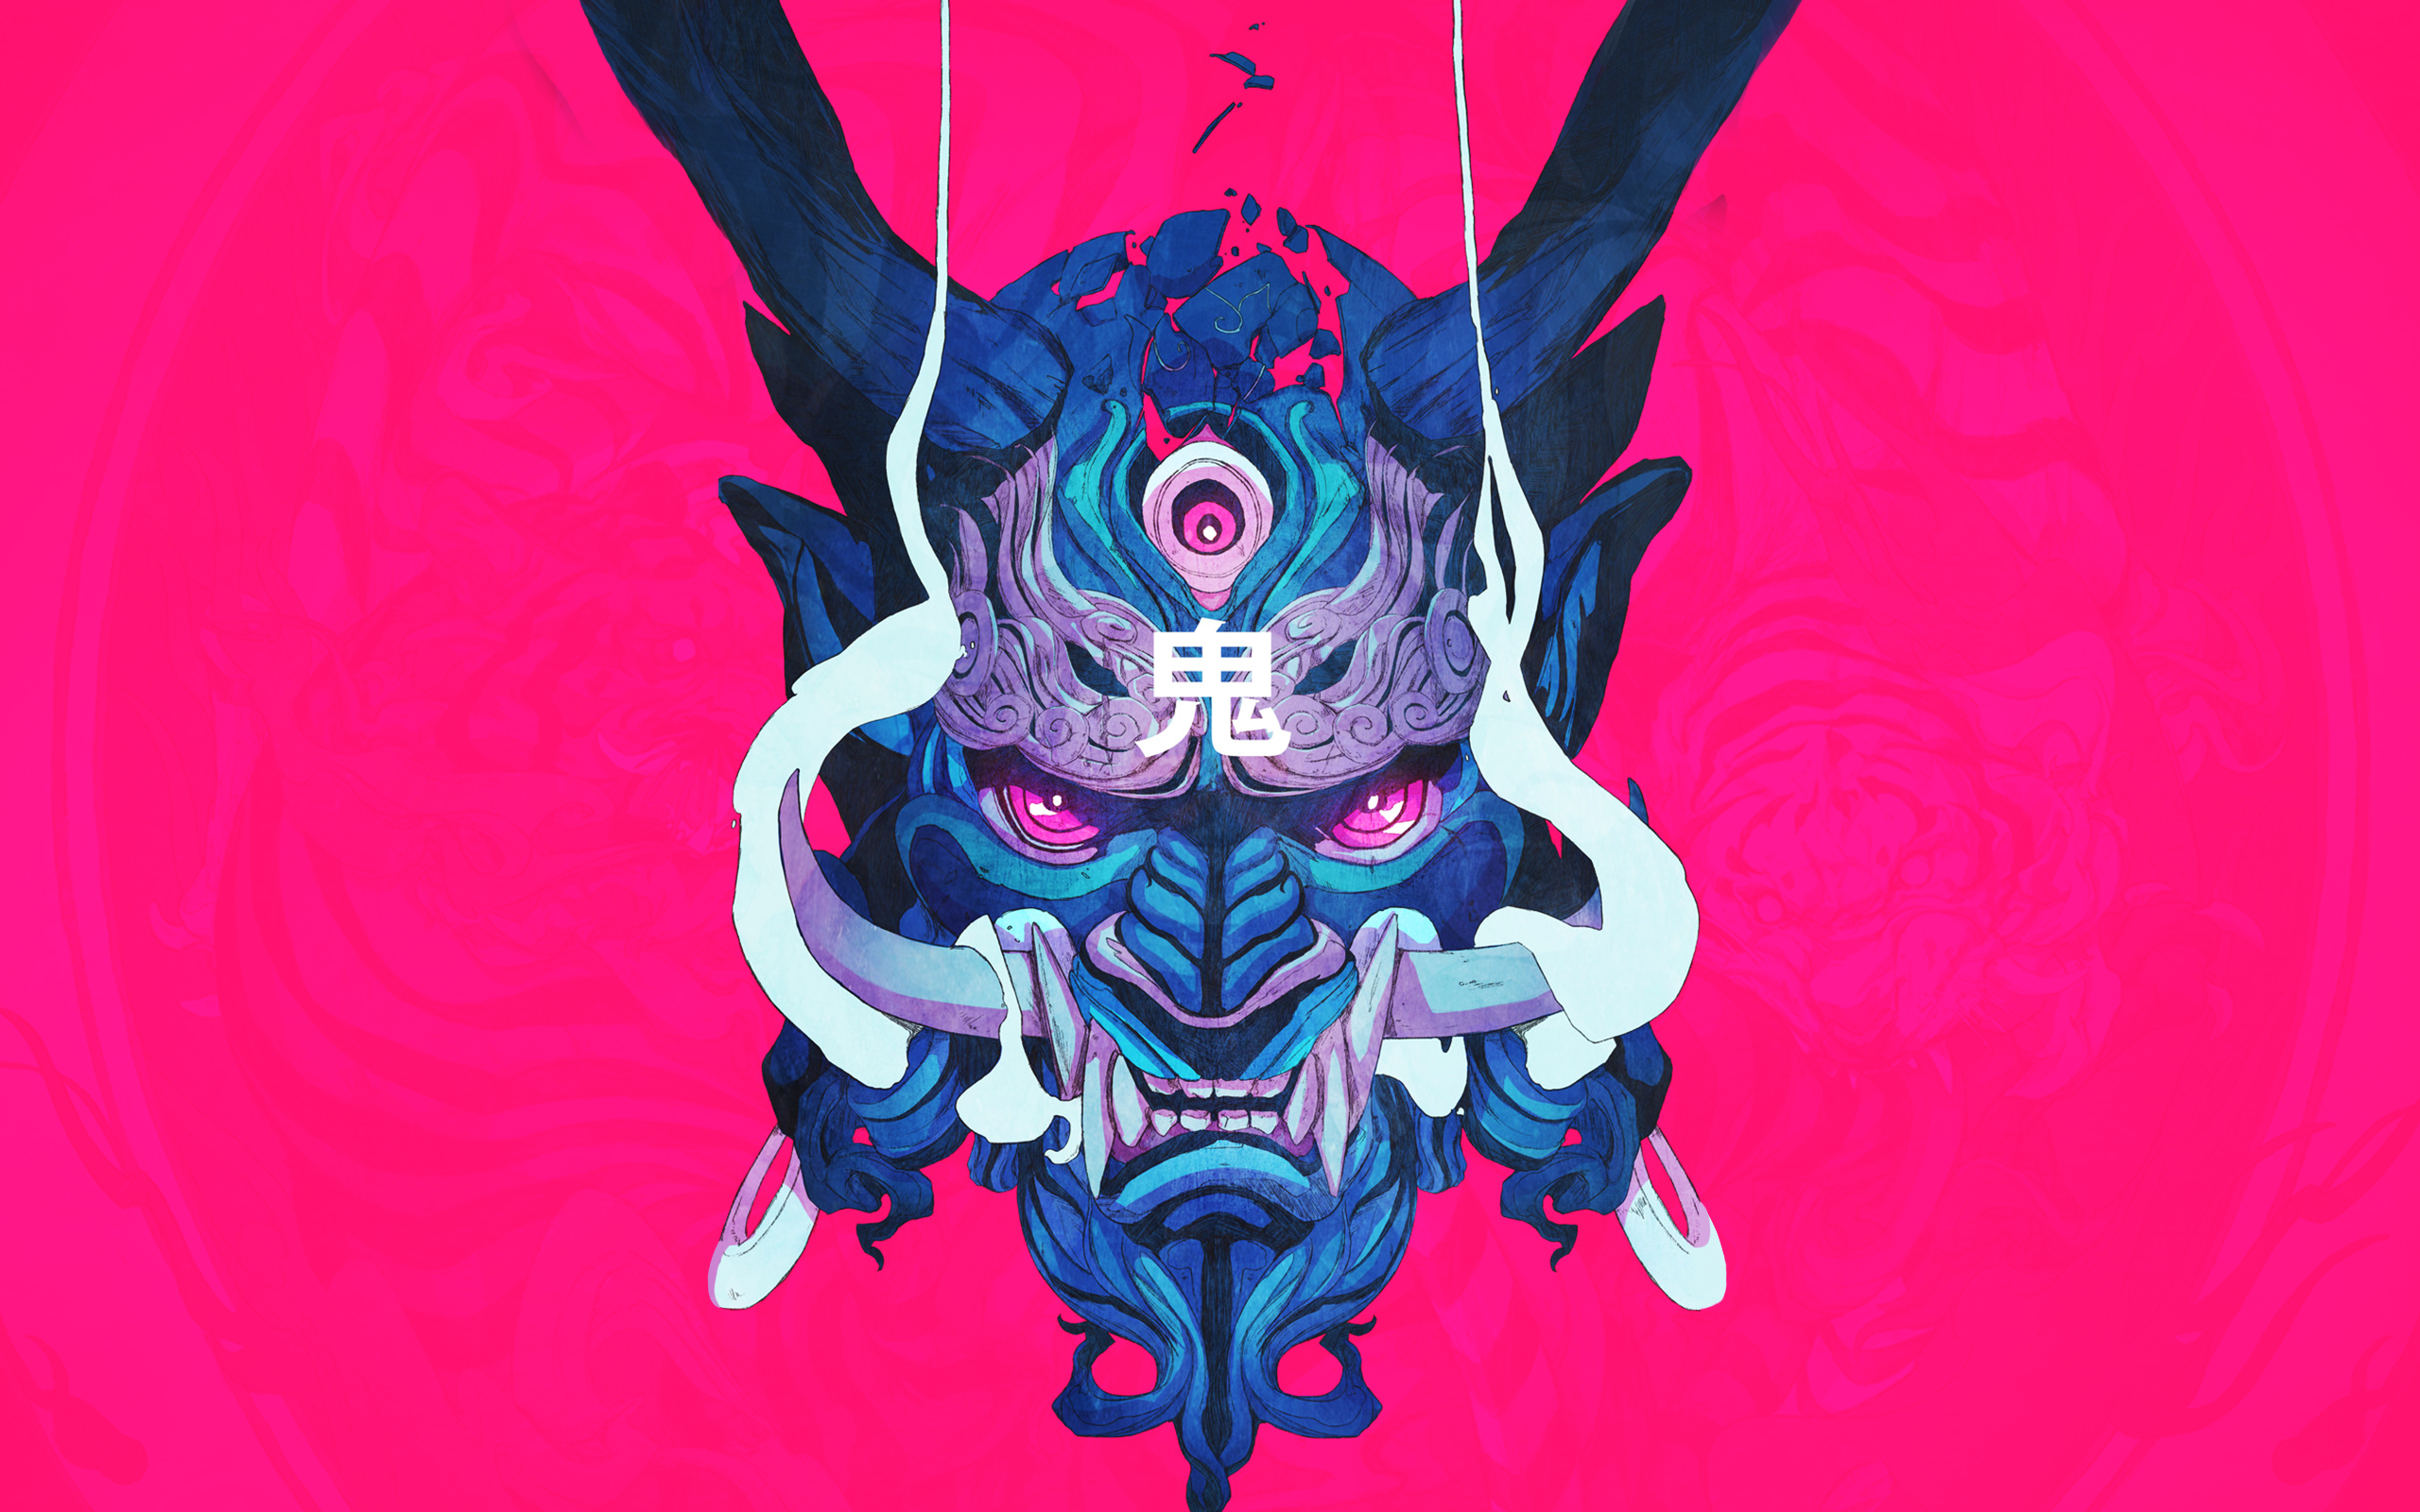 General 2560x1600 mask demon ChunLo illustration oni mask Chun Lo artwork pink blue looking at viewer digital samurai warrior sketches Ukiyo-e